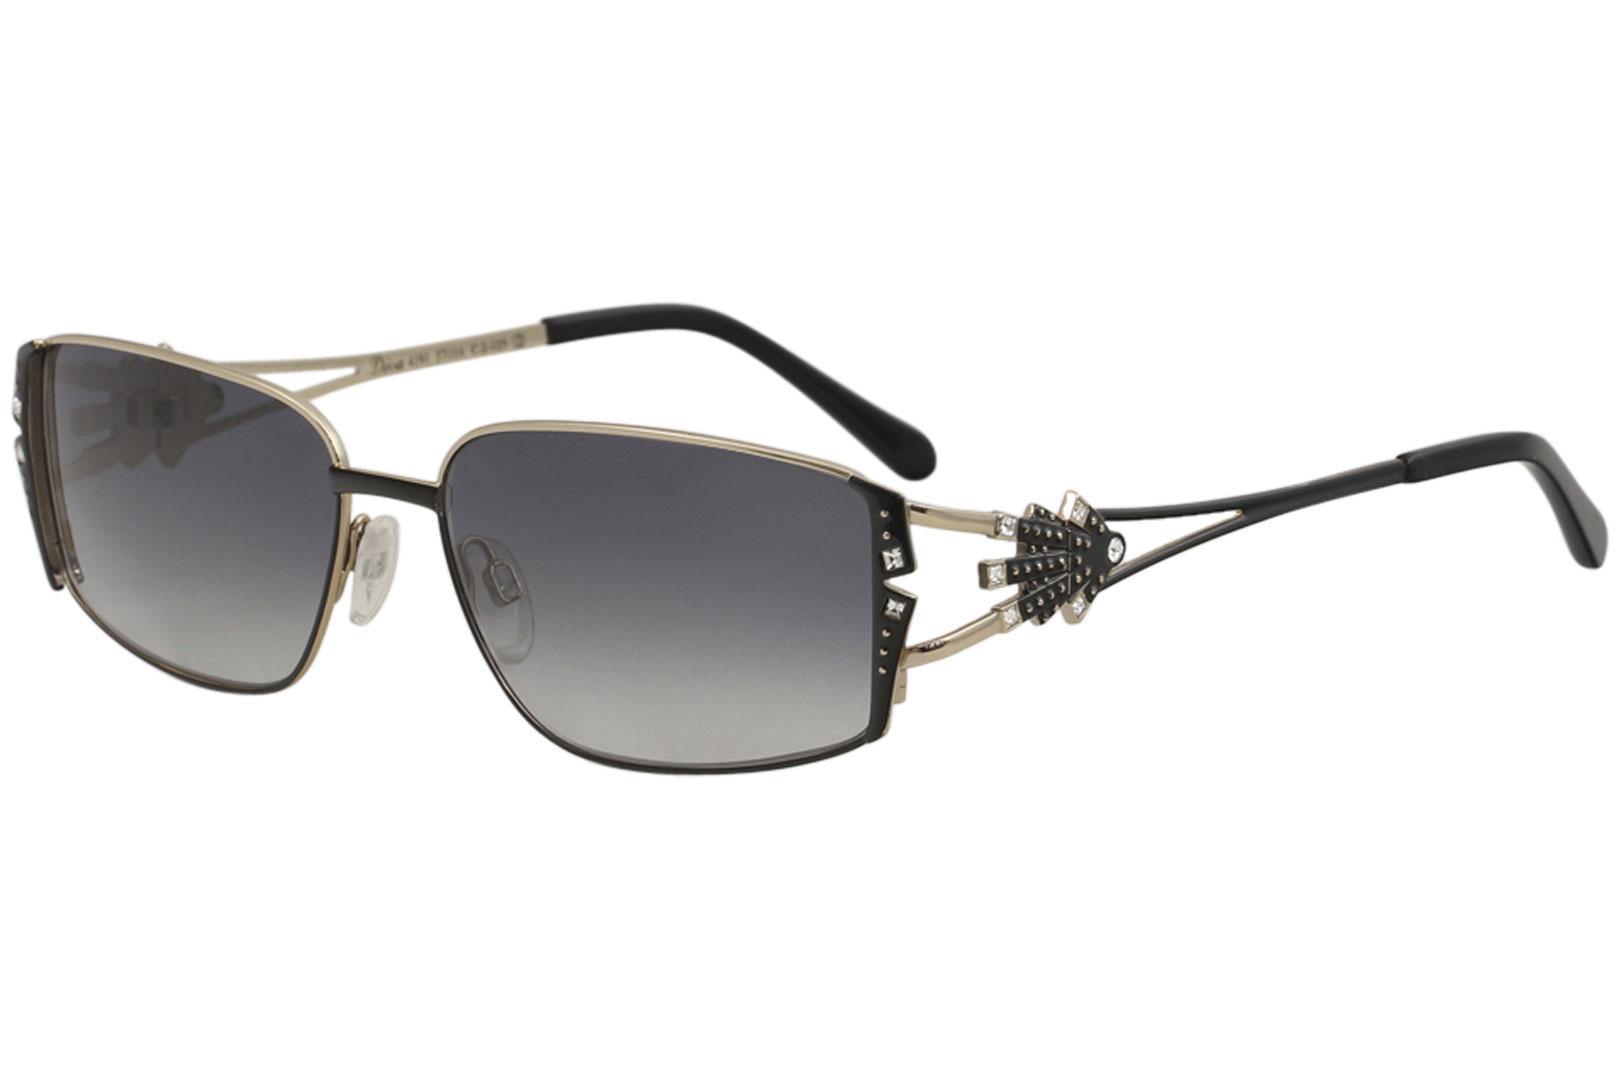 Image of Diva Women's 4191 Fashion Rectangle Sunglasses - Black Gold/Grey Gradient   02 - Lens 57 Bridge 16 Temple 125mm